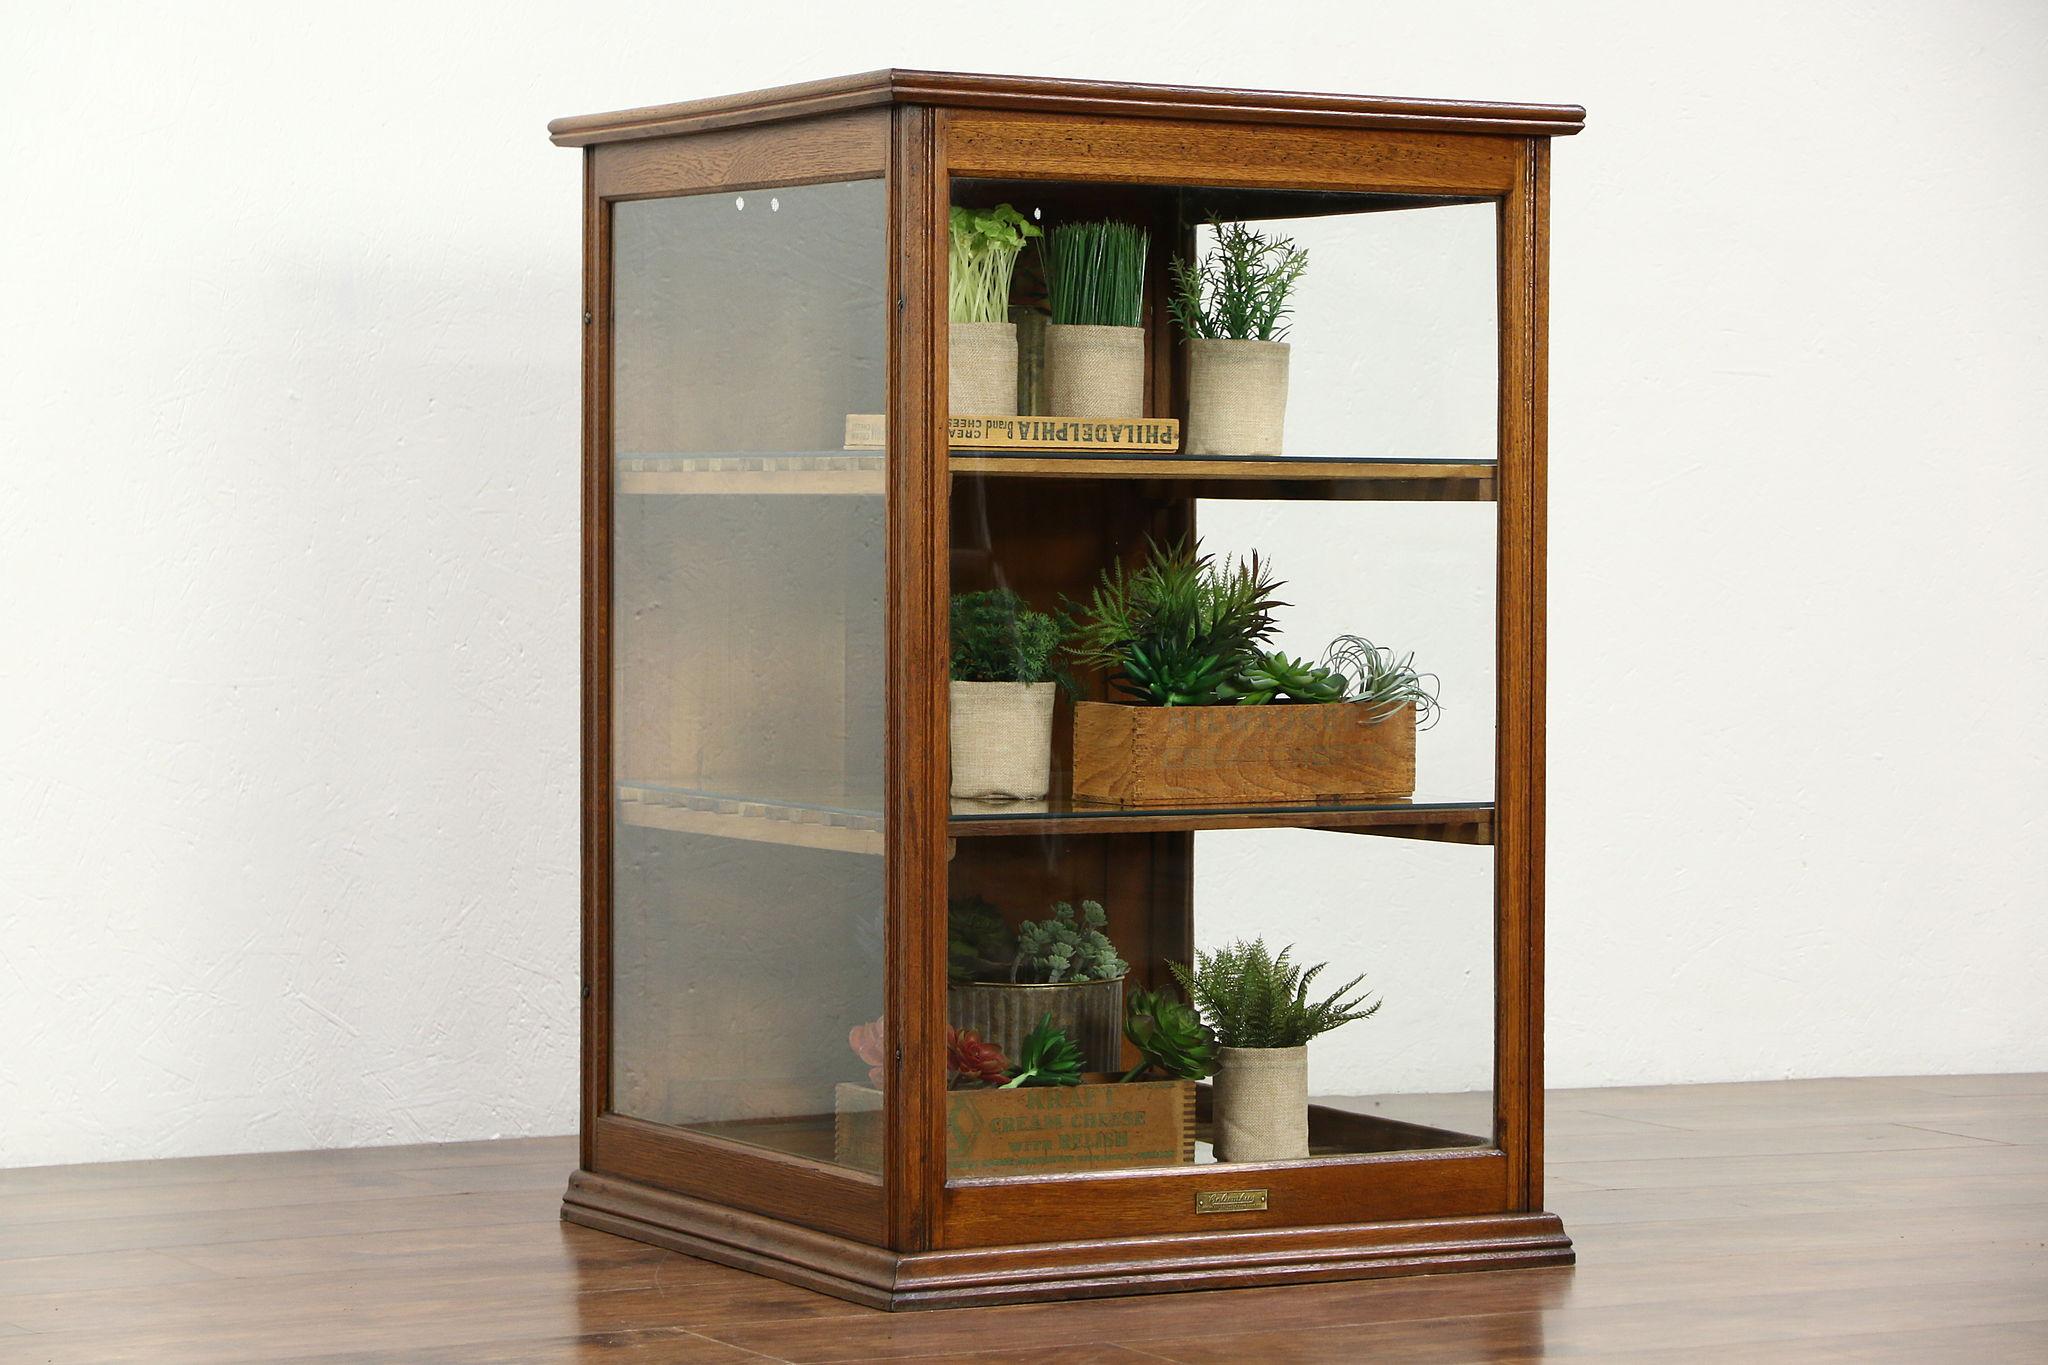 Antique Metal Dental Cabinet Sold Misc Furniture Harp Gallery Antiques